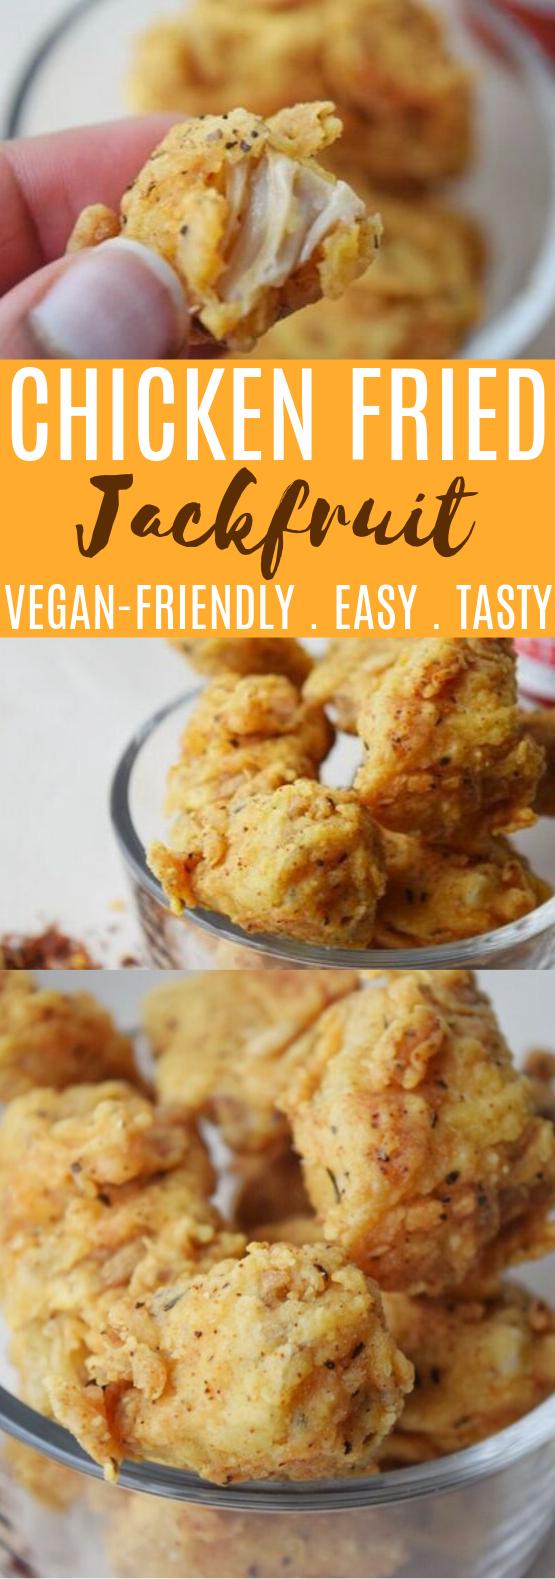 Chicken Fried Jackfruit #vegan #appetizers